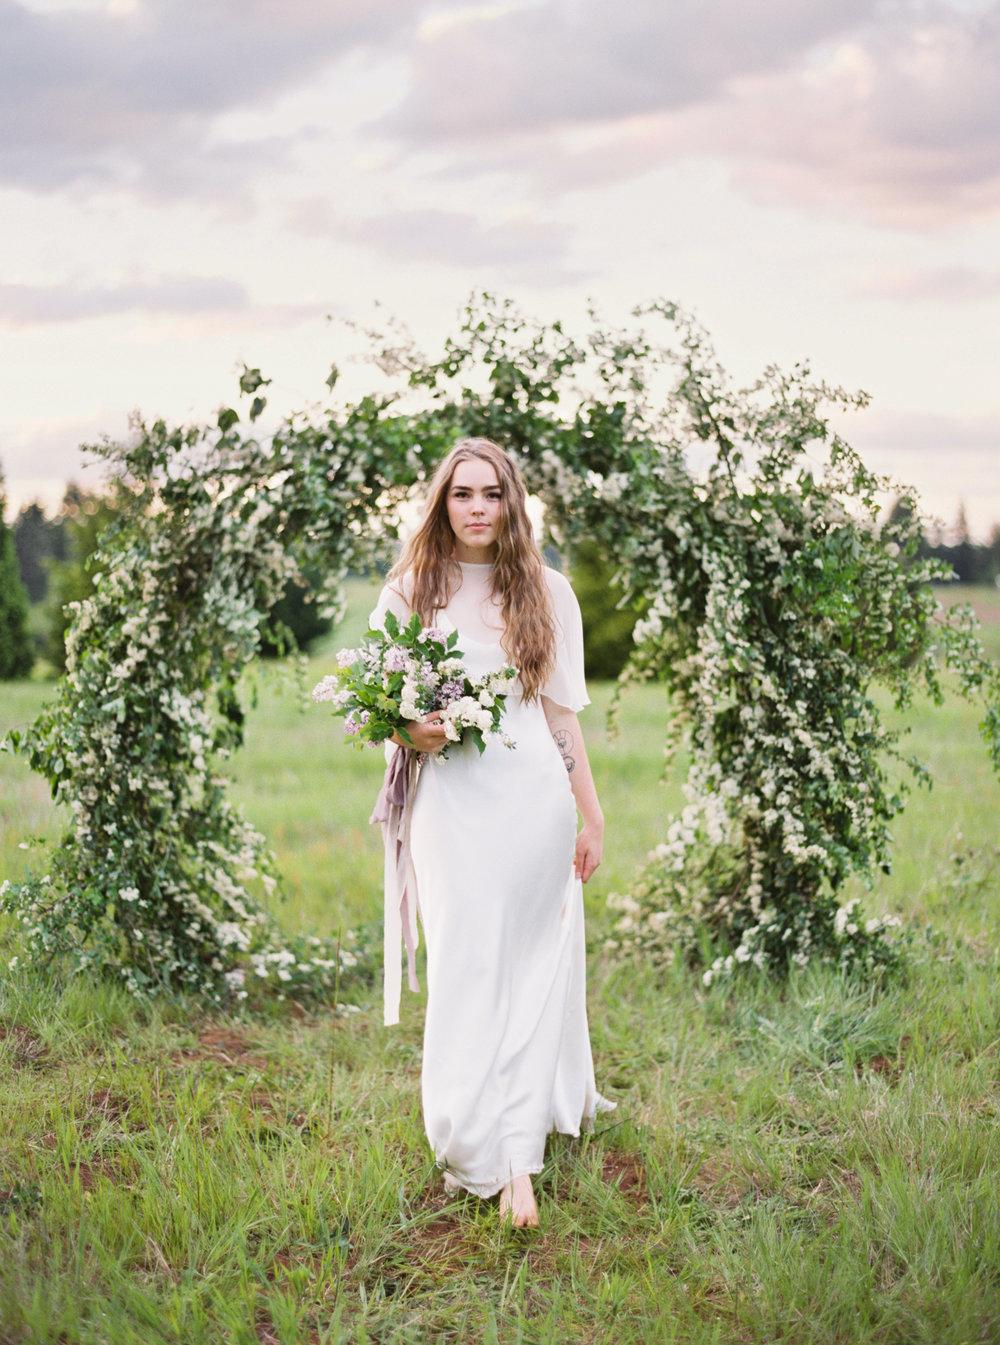 023-selva-floral-portland-napa-los-angeles-hawaii-wedding-florist.jpg